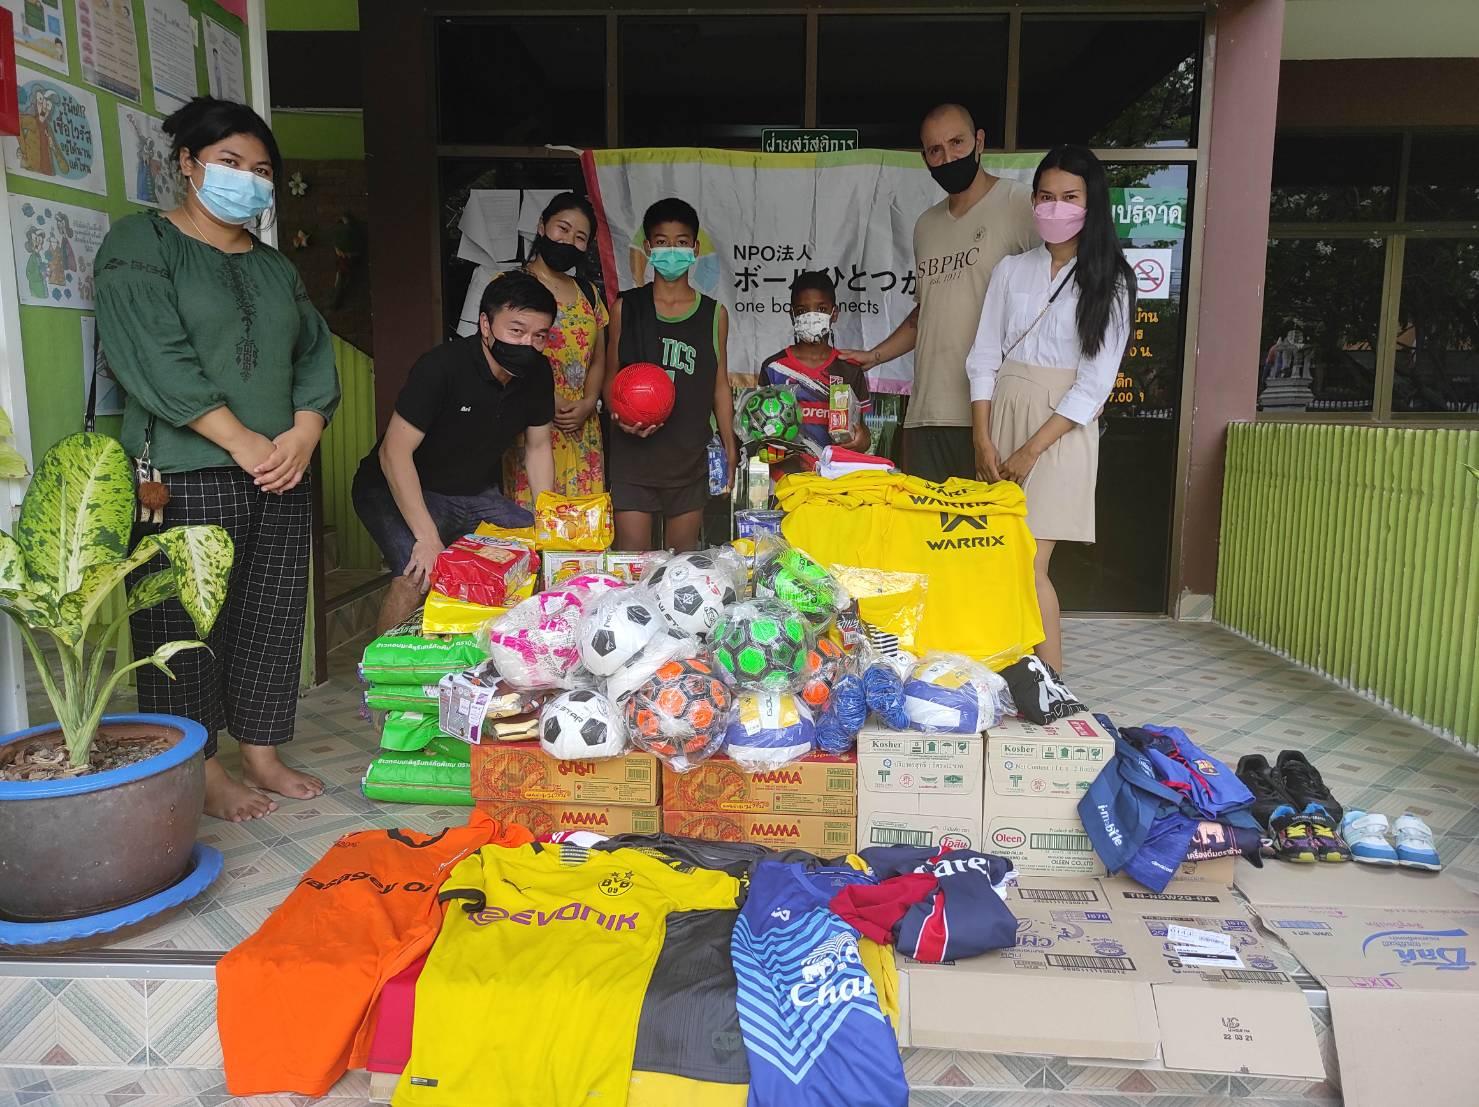 NPOボールひとつが繋ぐ縁17 タイ王国 バンコク bannmahamek LIVE支援(2021年4月17日)